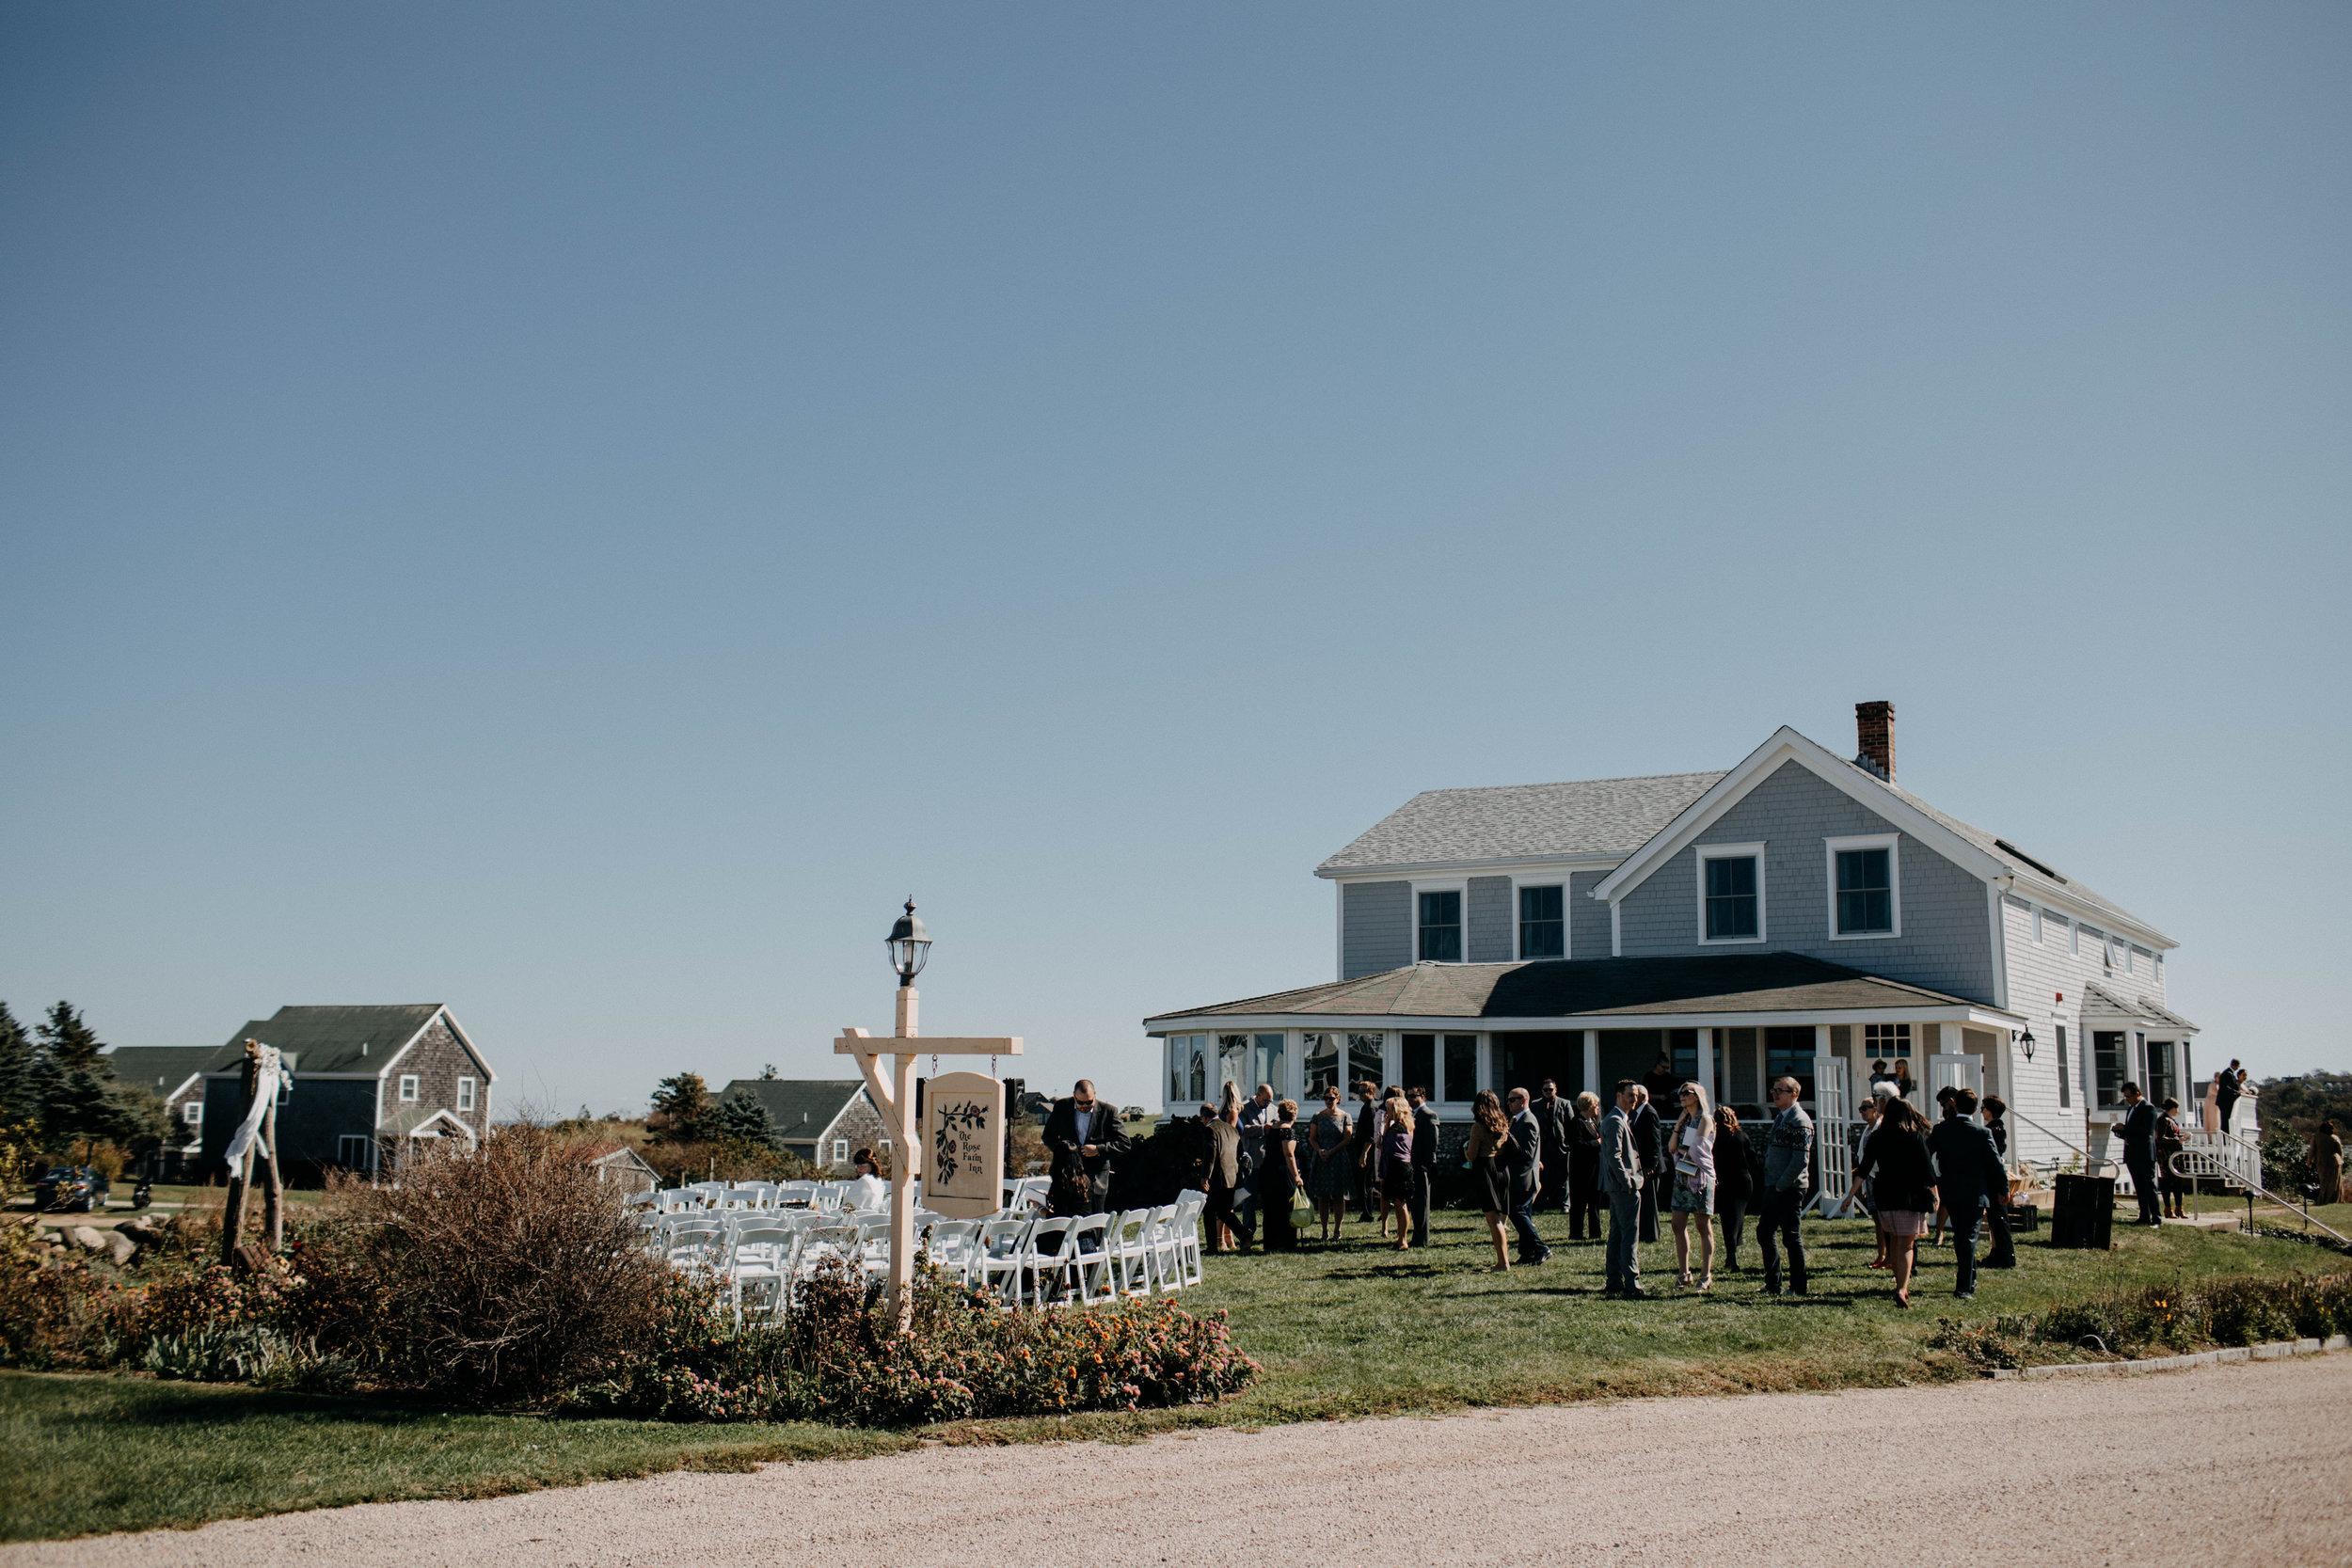 intimate block island rhode island wedding rose farm inn wedding east coast wedding photographer163.jpg